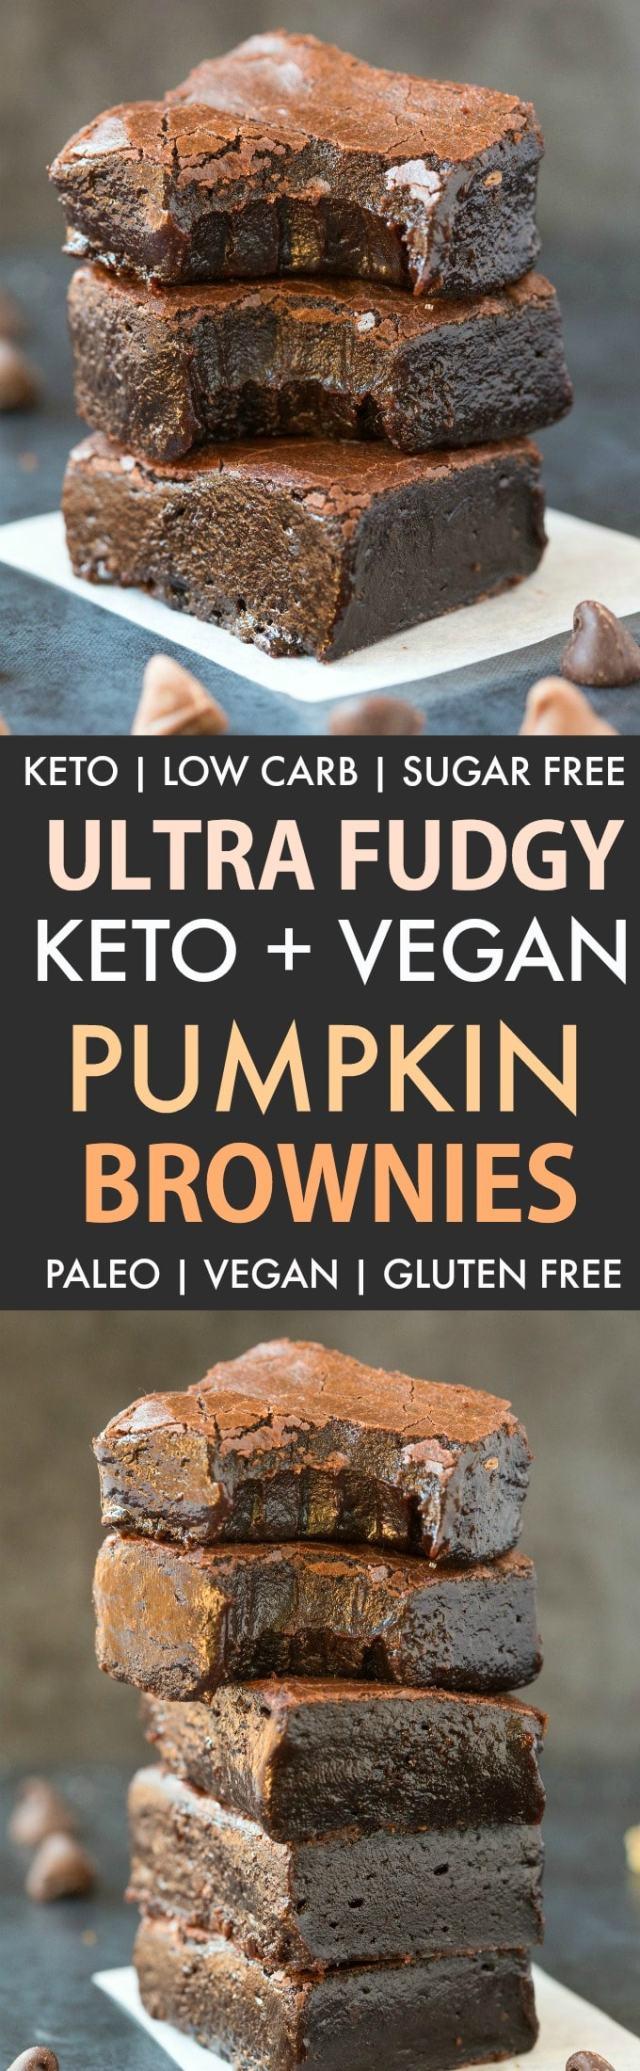 Fudgy Keto Vegan Pumpkin Brownies